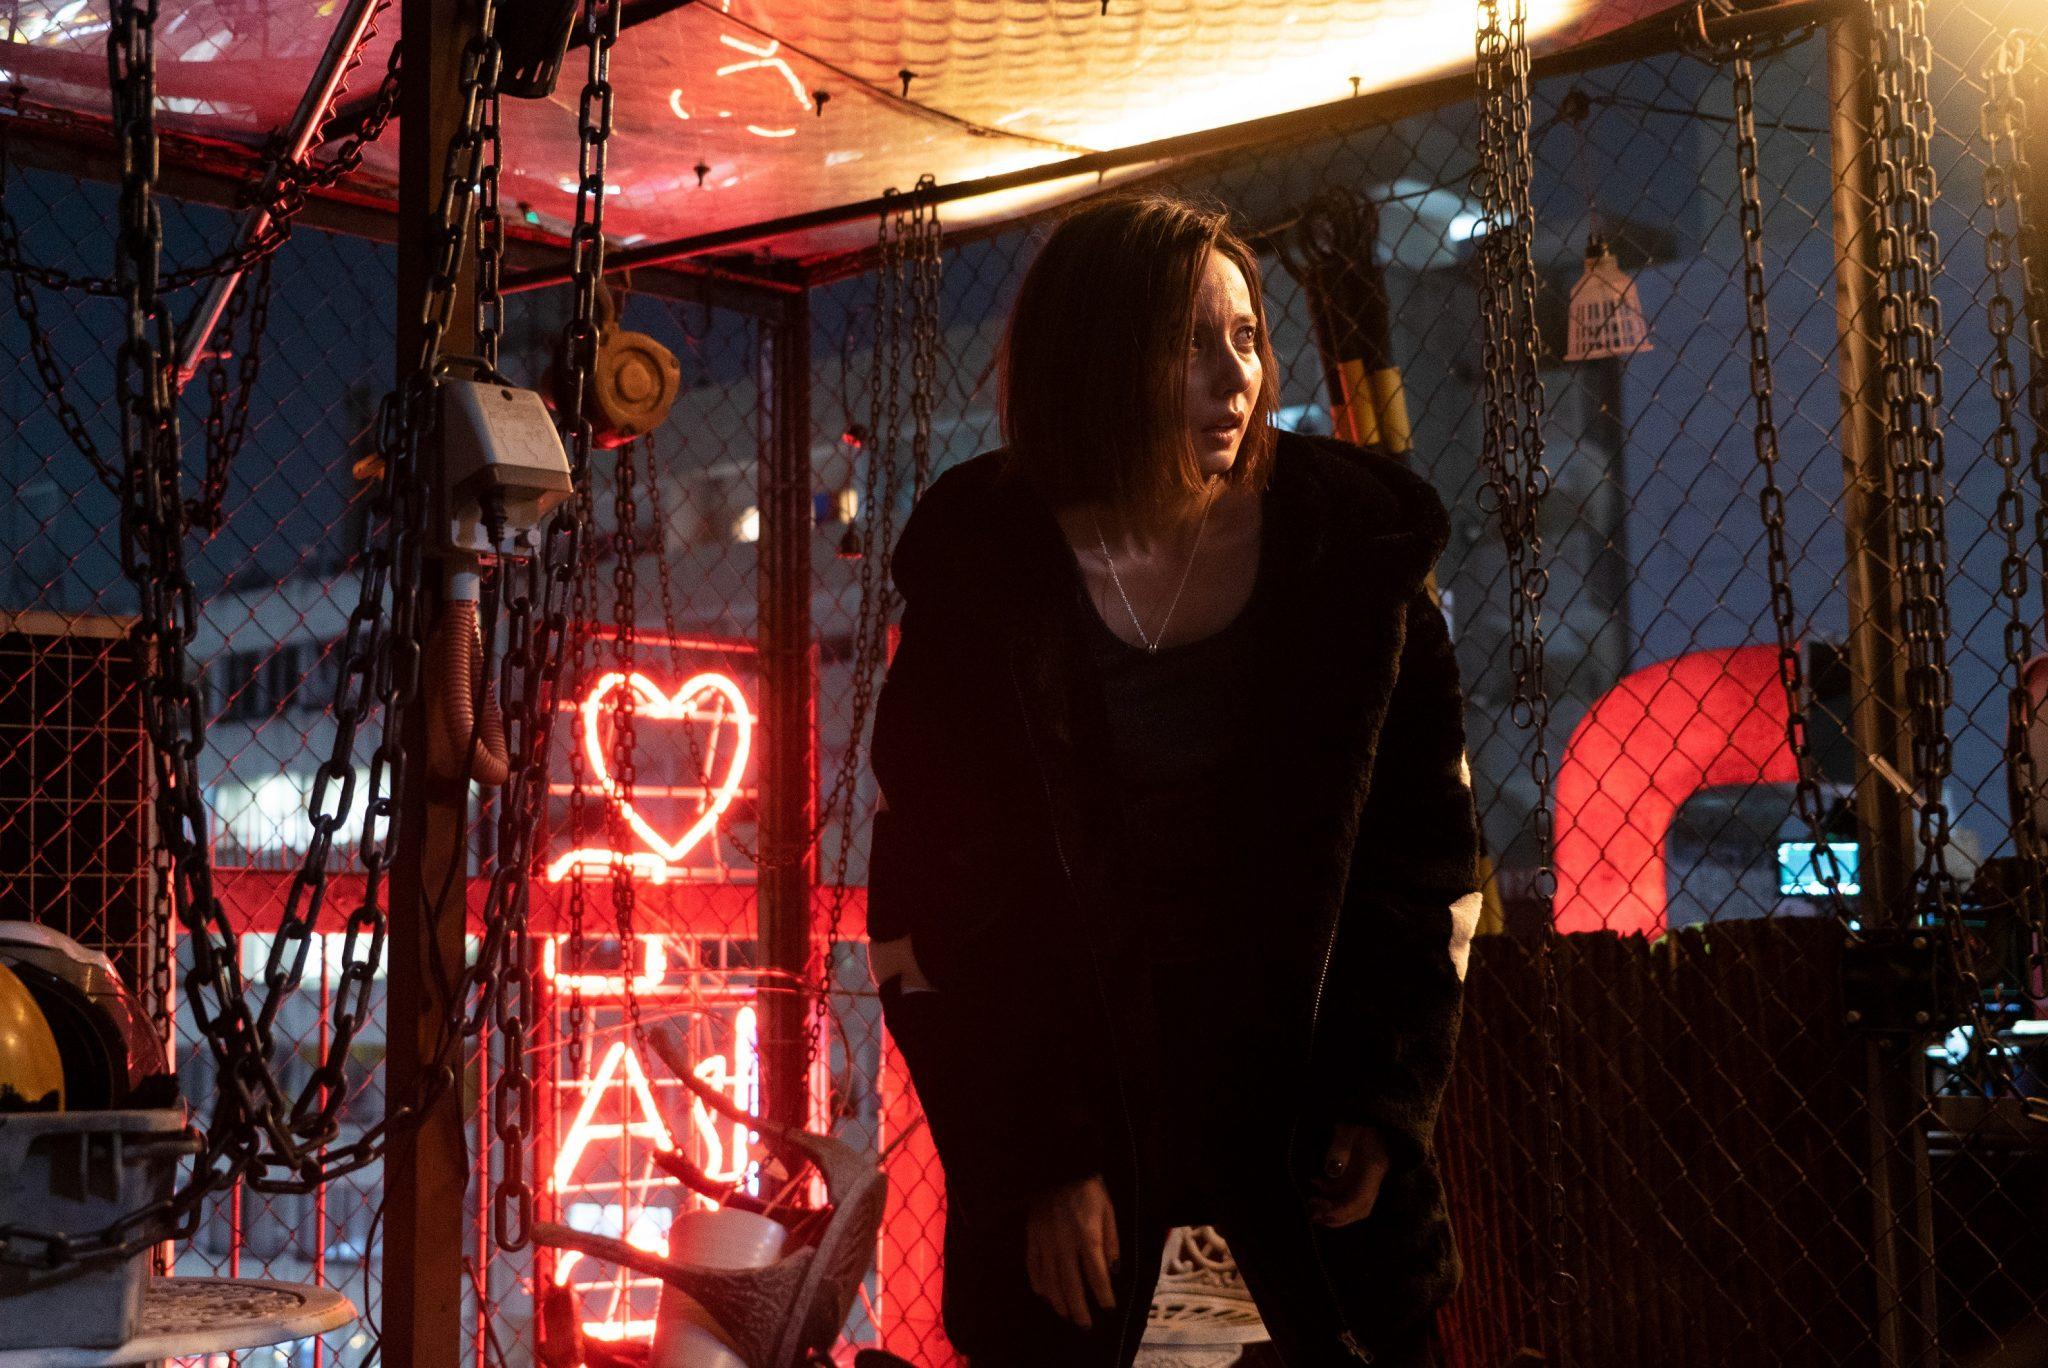 SAMURAI MARATHON on Digital HD (20 January) & FIRST LOVE in UK Cinemas + Blu-ray, DVD and Digital HD (14th February) from Signature Entertainment